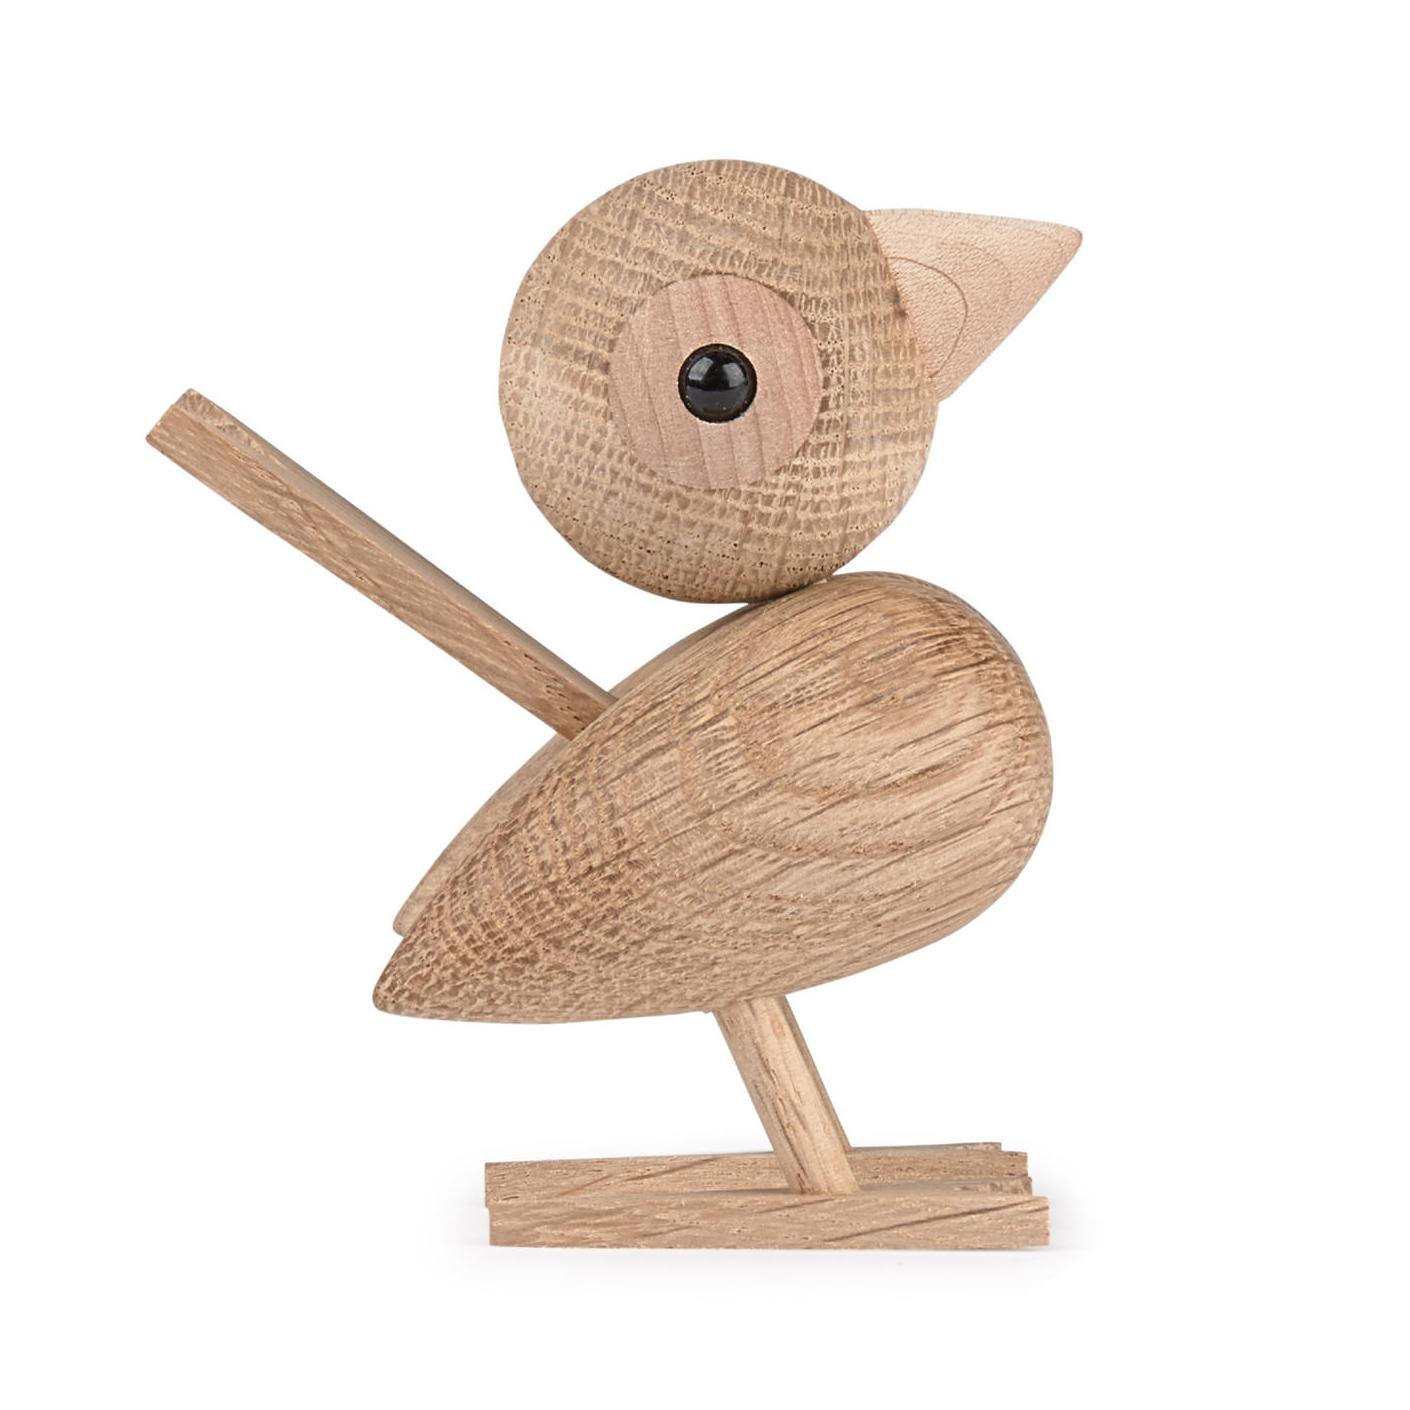 sparrow-oiseau-lucie-kaas-bois-decoration-soldes-melijoe